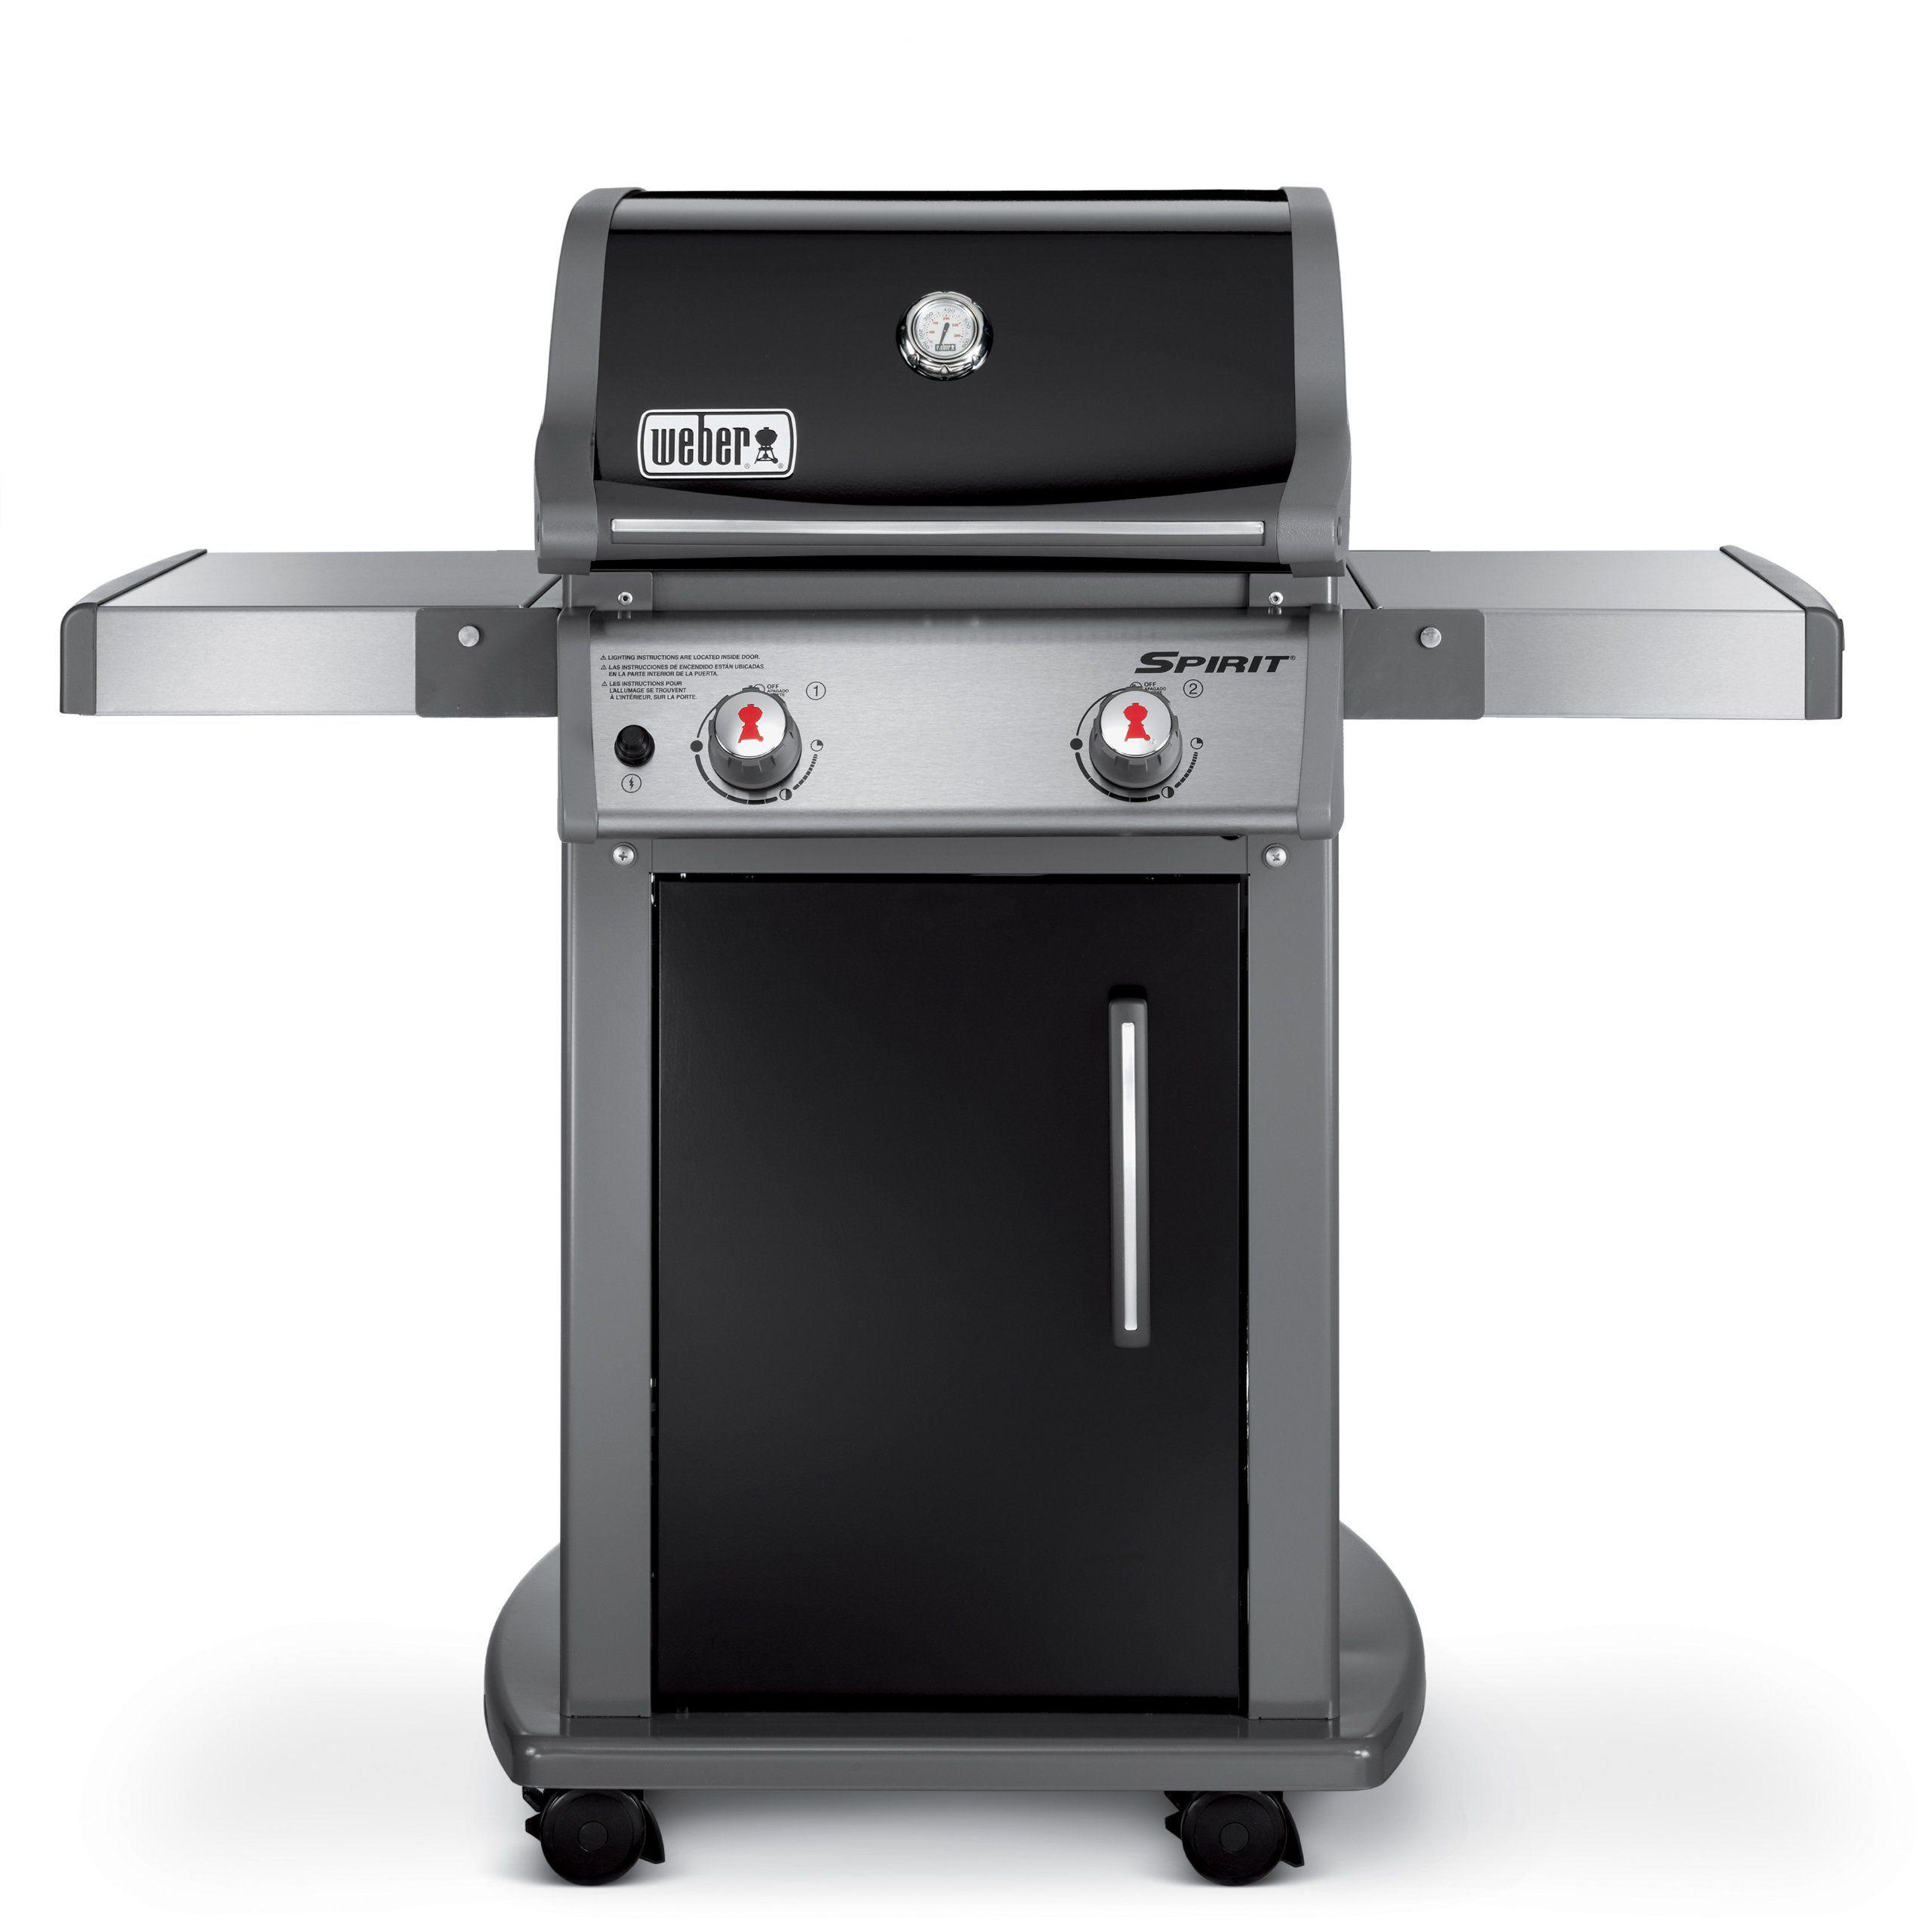 Weber 46110001 Spirit E210 Liquid Propane Gas Grill Black Natural Gas Grill Gas Grill Reviews Propane Gas Grill